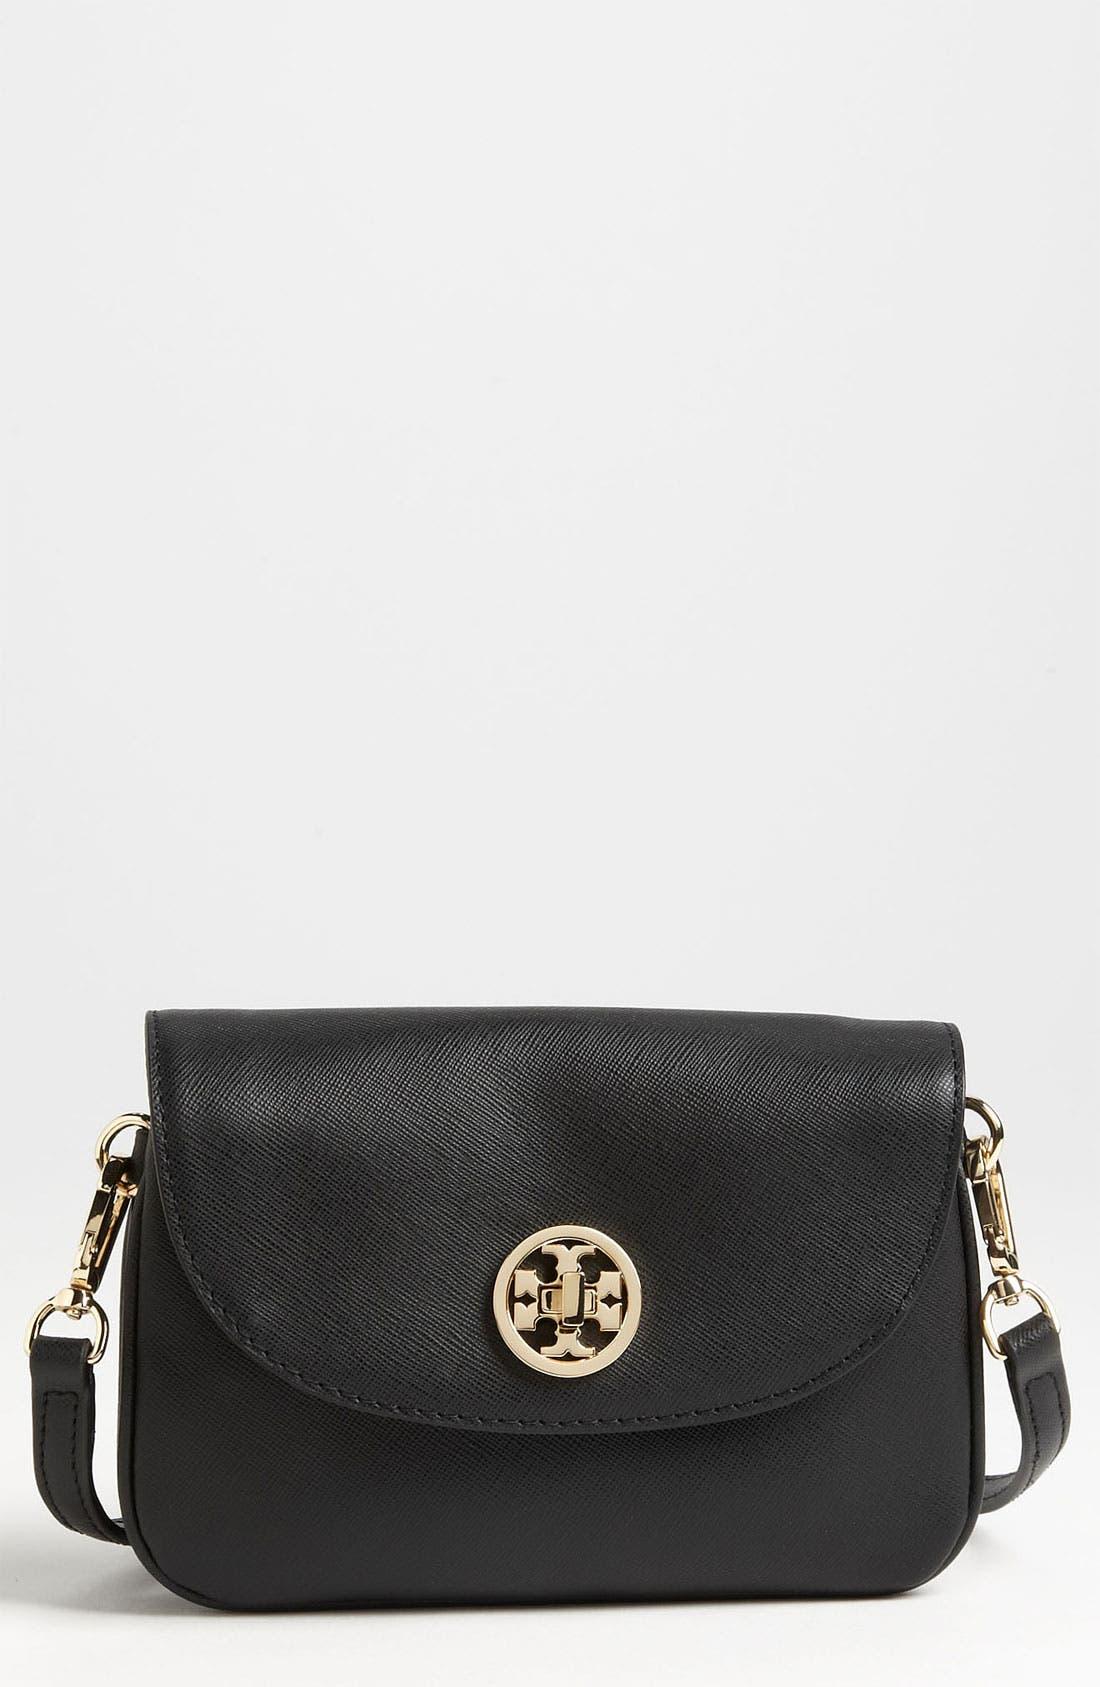 Alternate Image 1 Selected - Tory Burch 'Robinson' Leather Crossbody Bag